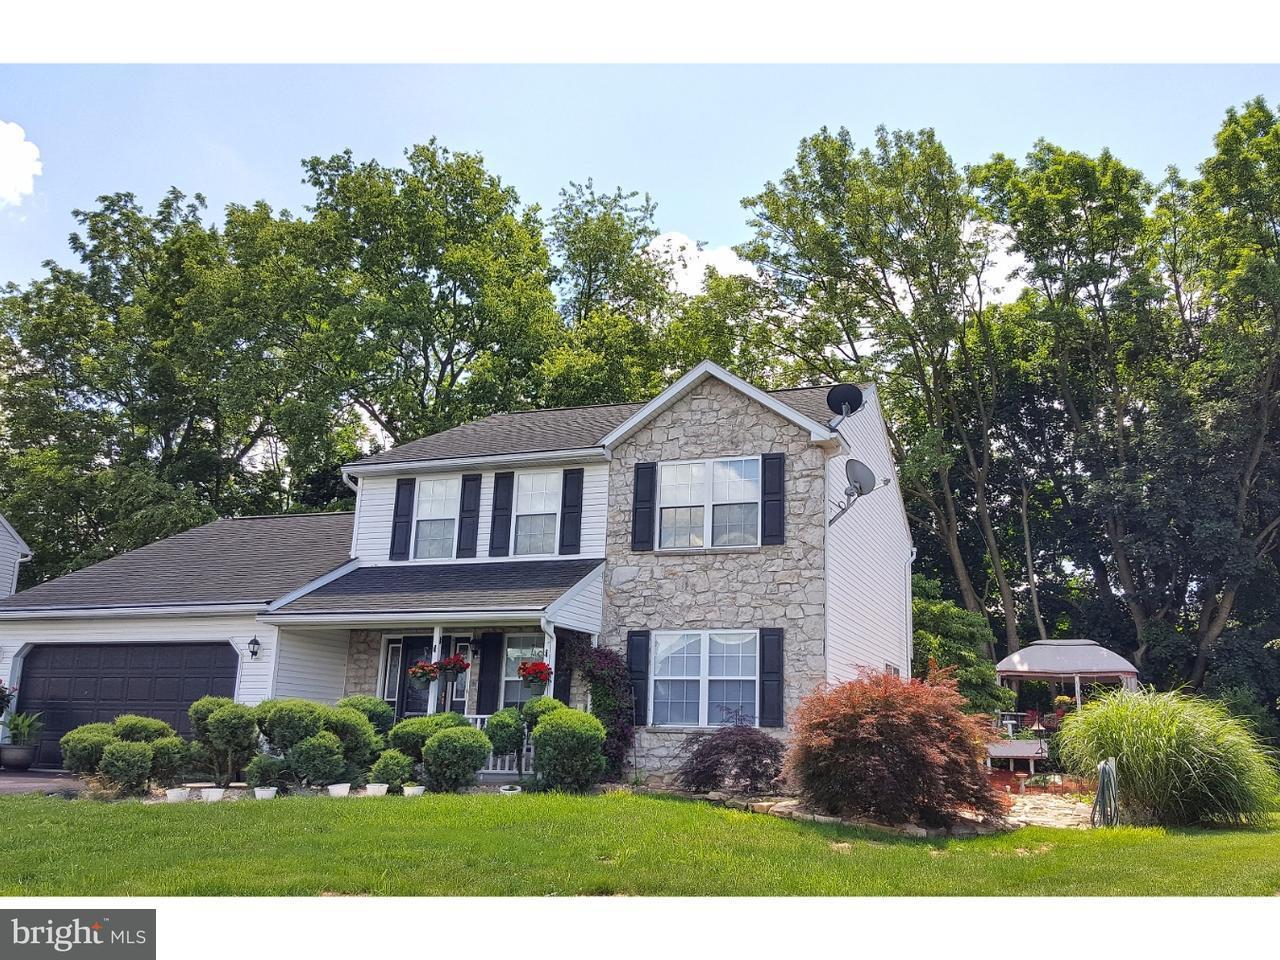 Single Family Home for Sale at 119 CORNERSTONE Drive Blandon, Pennsylvania 19510 United States